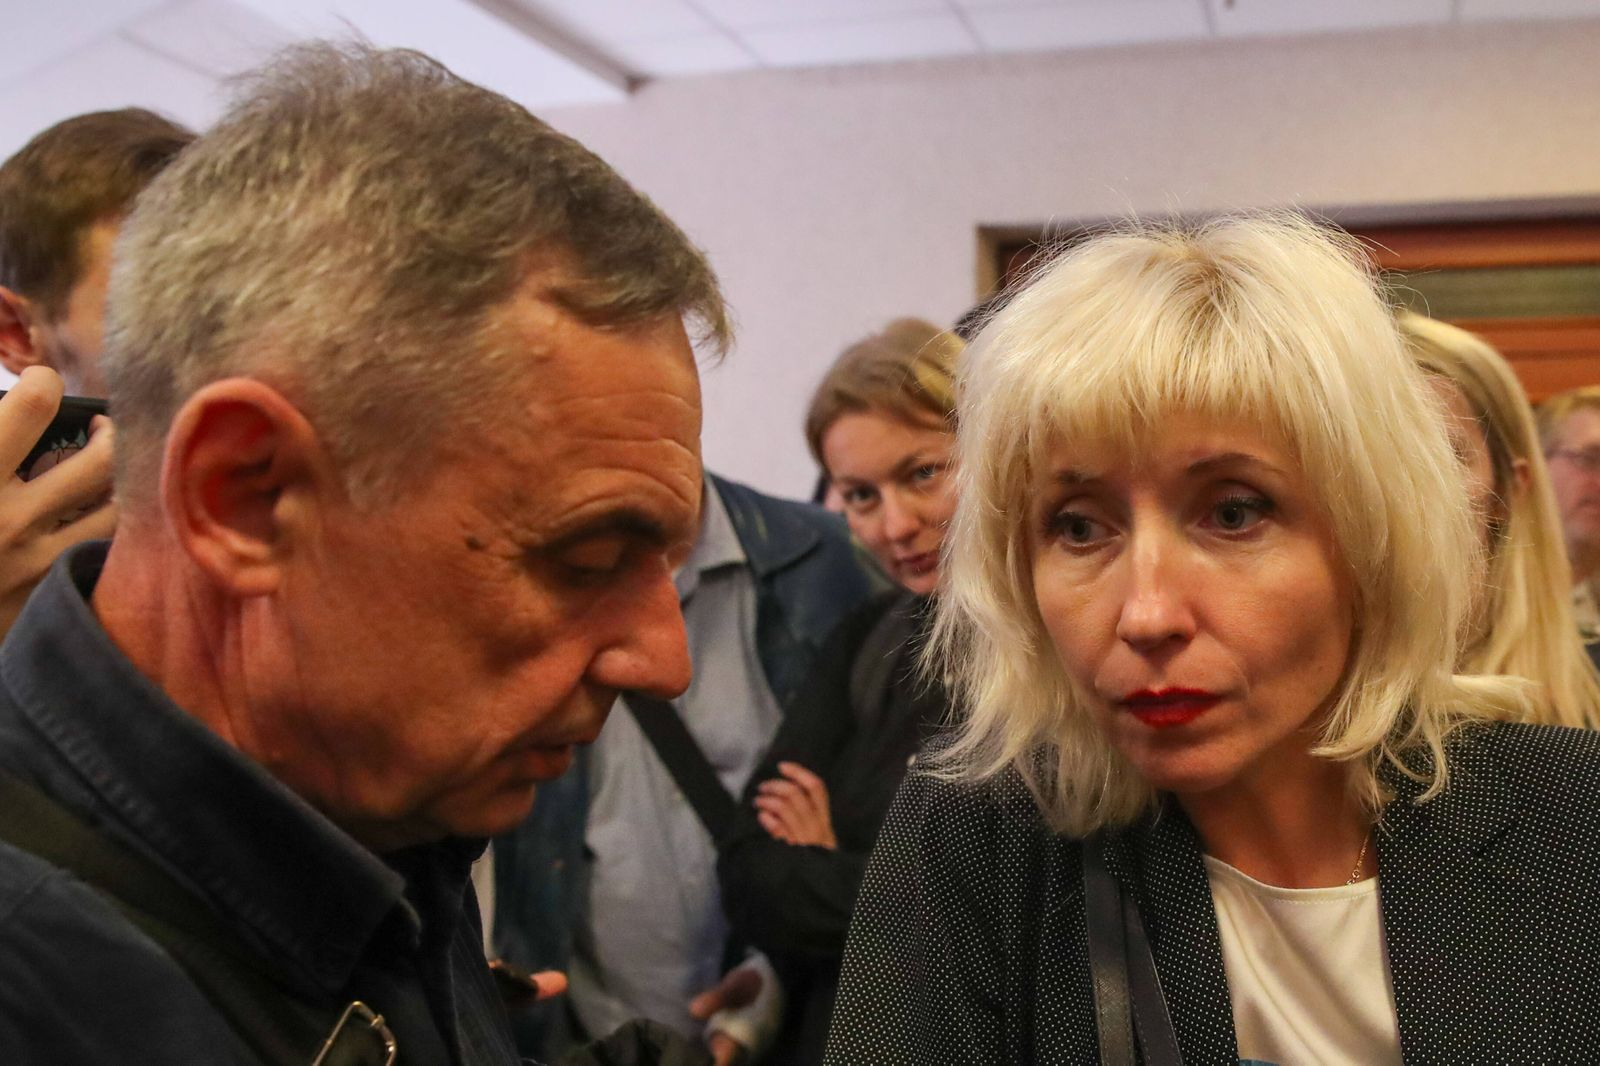 MINSK, BELARUS - SEPTEMBER 21, 2020: Maria Kolesnikova s father Alexander Kolesnikov (L) and lawyer Lyudmila Kazak talk